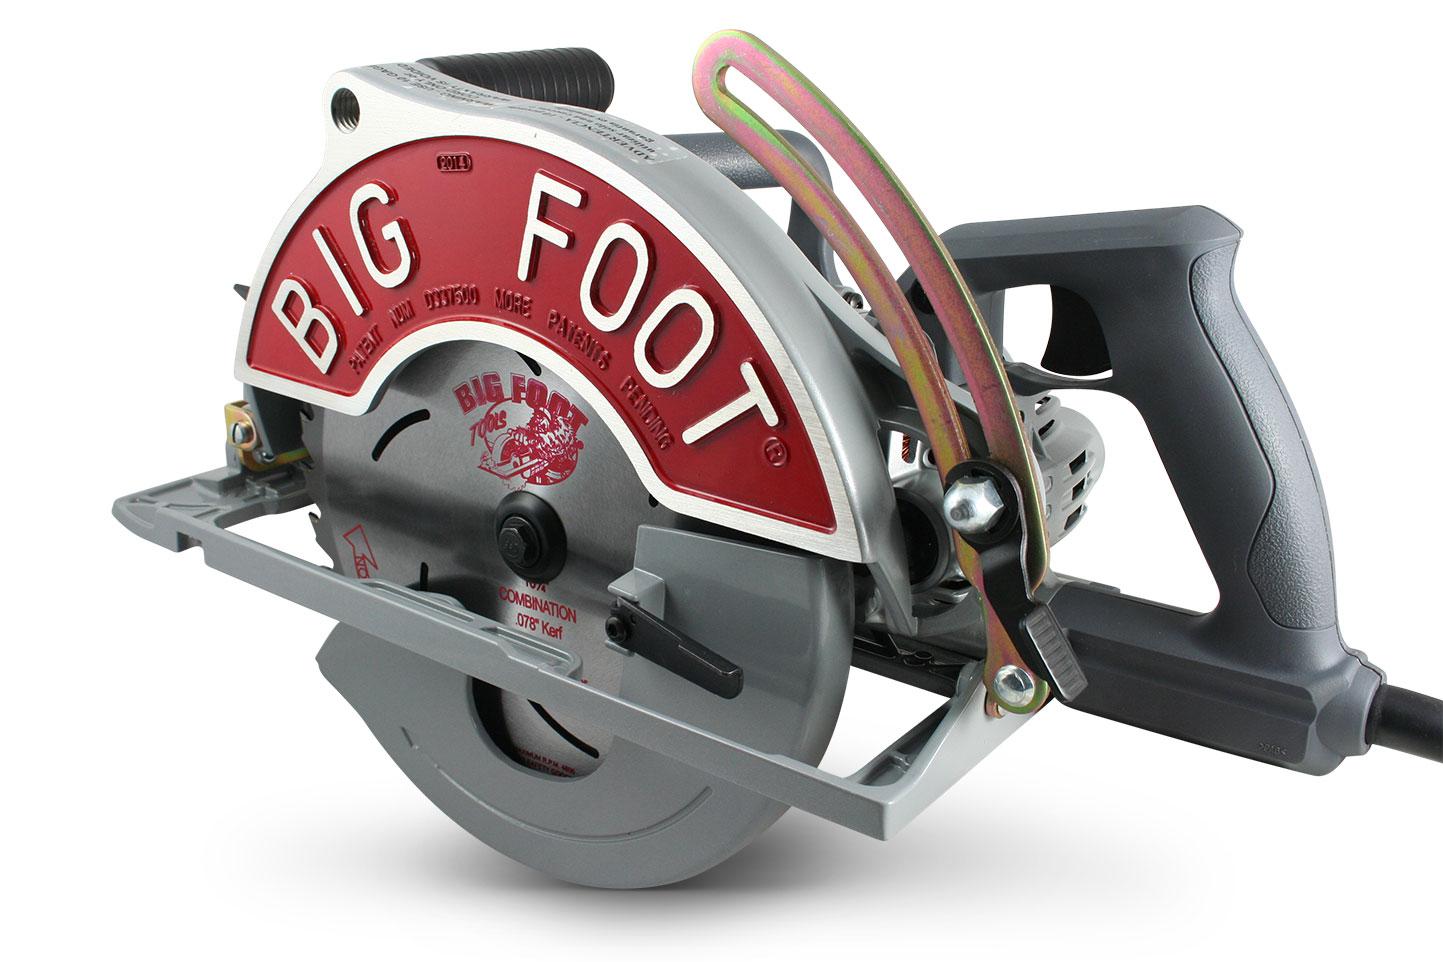 "BIG FOOT 10 - 1/4"" BEAM SAW ADAPTER KIT"